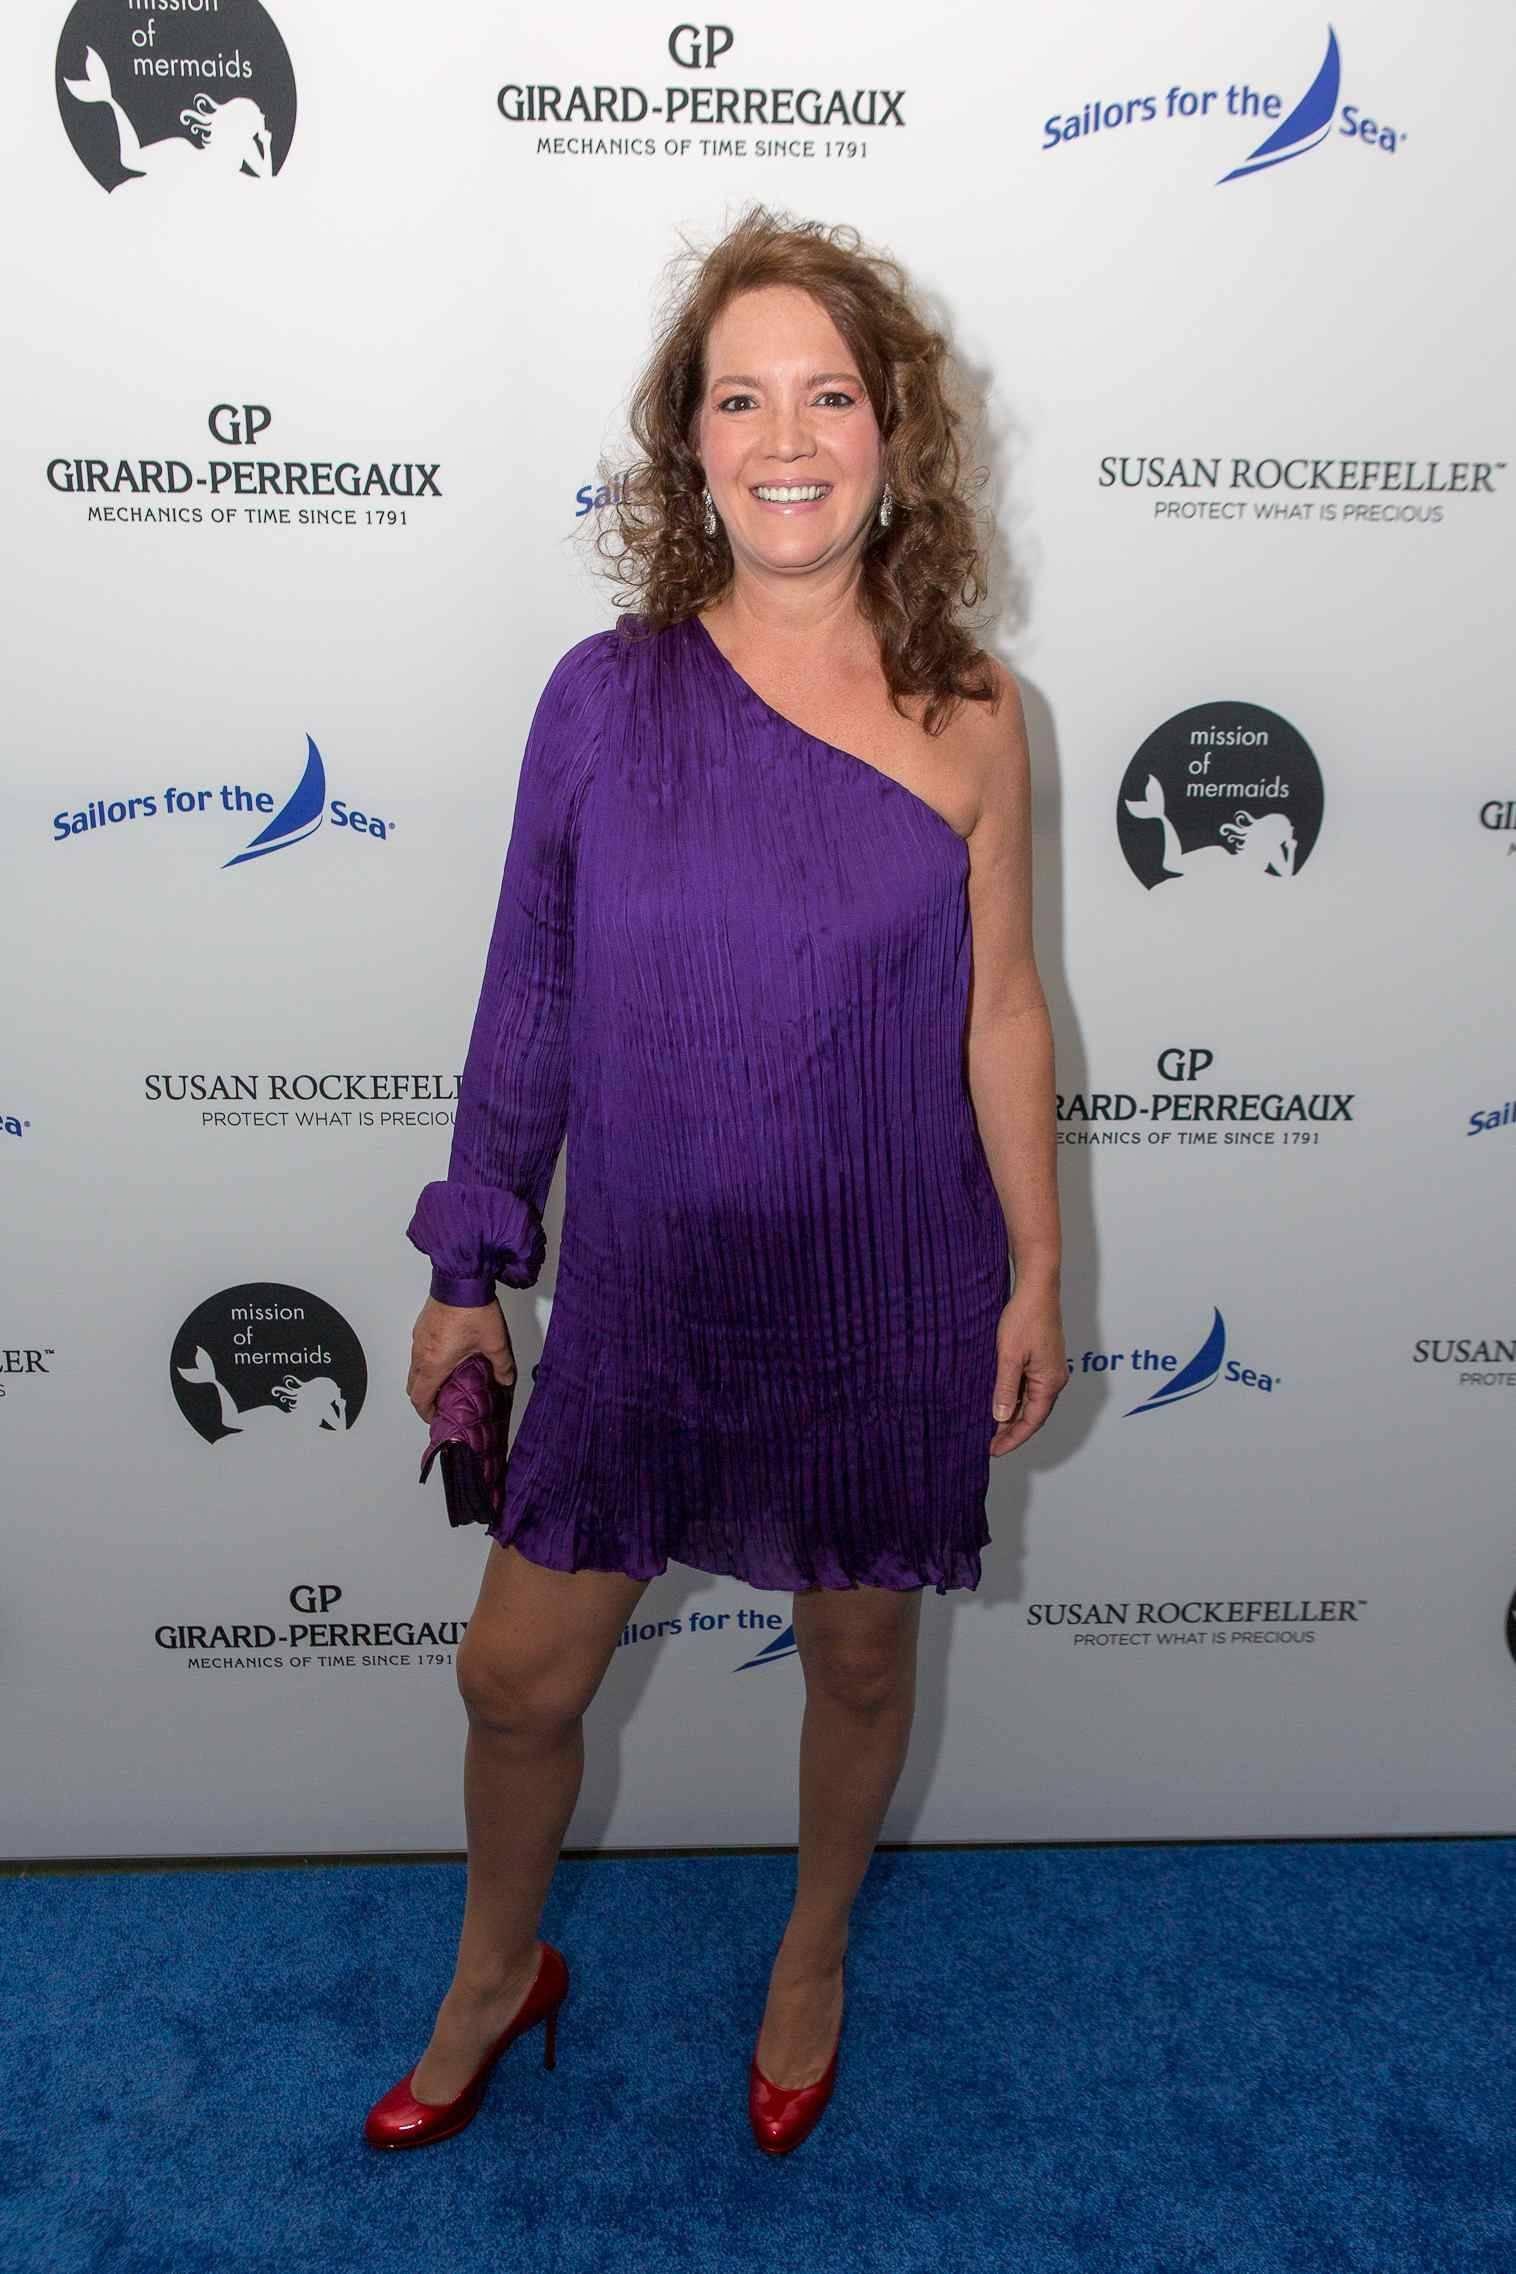 Peggy Bonapace